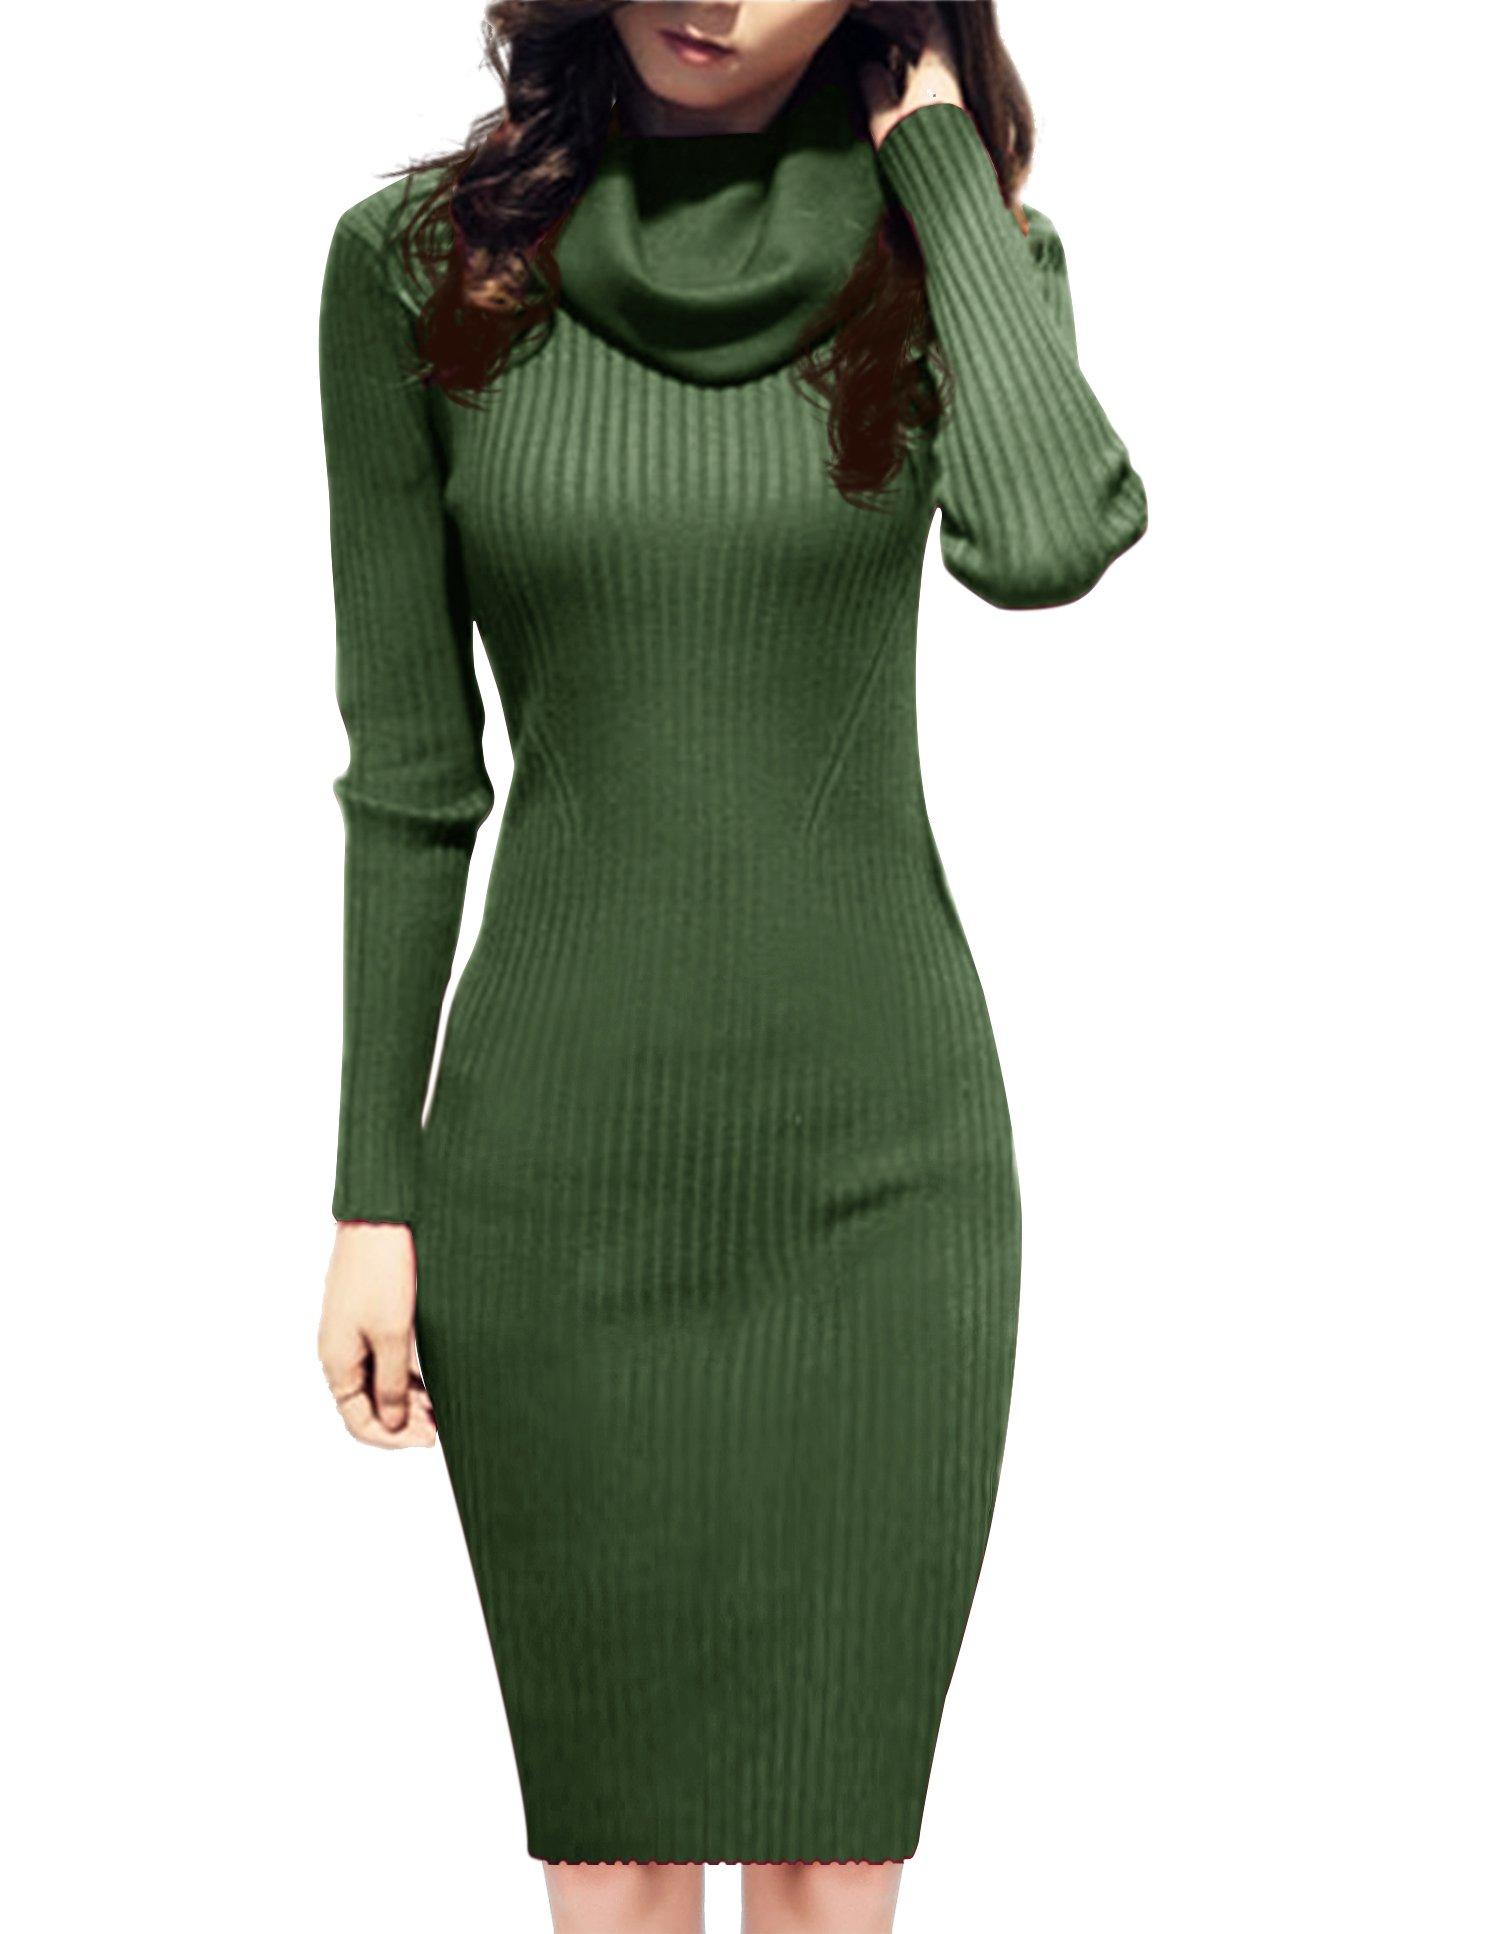 v28 Women Knit Cowl Neck Elastic Long Sleeve Stretchable Slim Knee Sweater Dress (Size2-8, ArmyGreen)